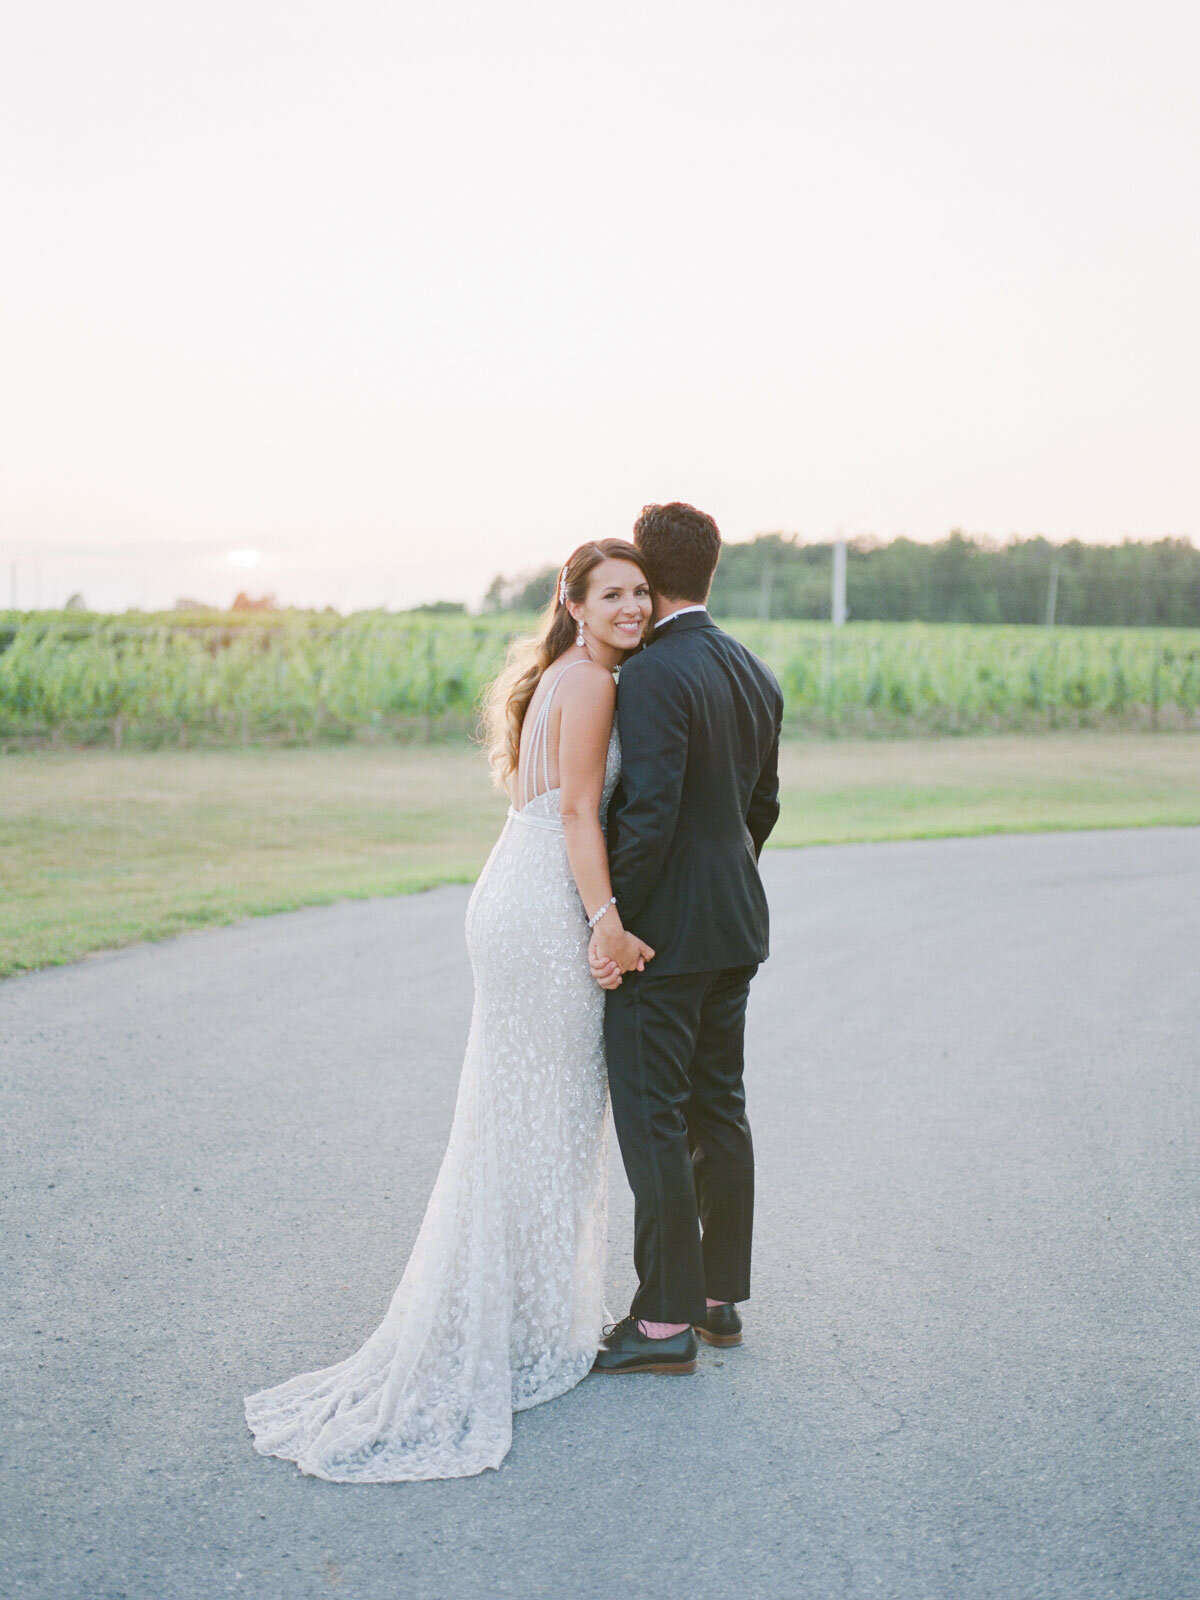 Chateau-des-Charmes-Wedding-Summer-Vineyard-Bride-Niagara-on-the-Lake-photos-by-Gemini-Photography-Ontario-0081.jpg